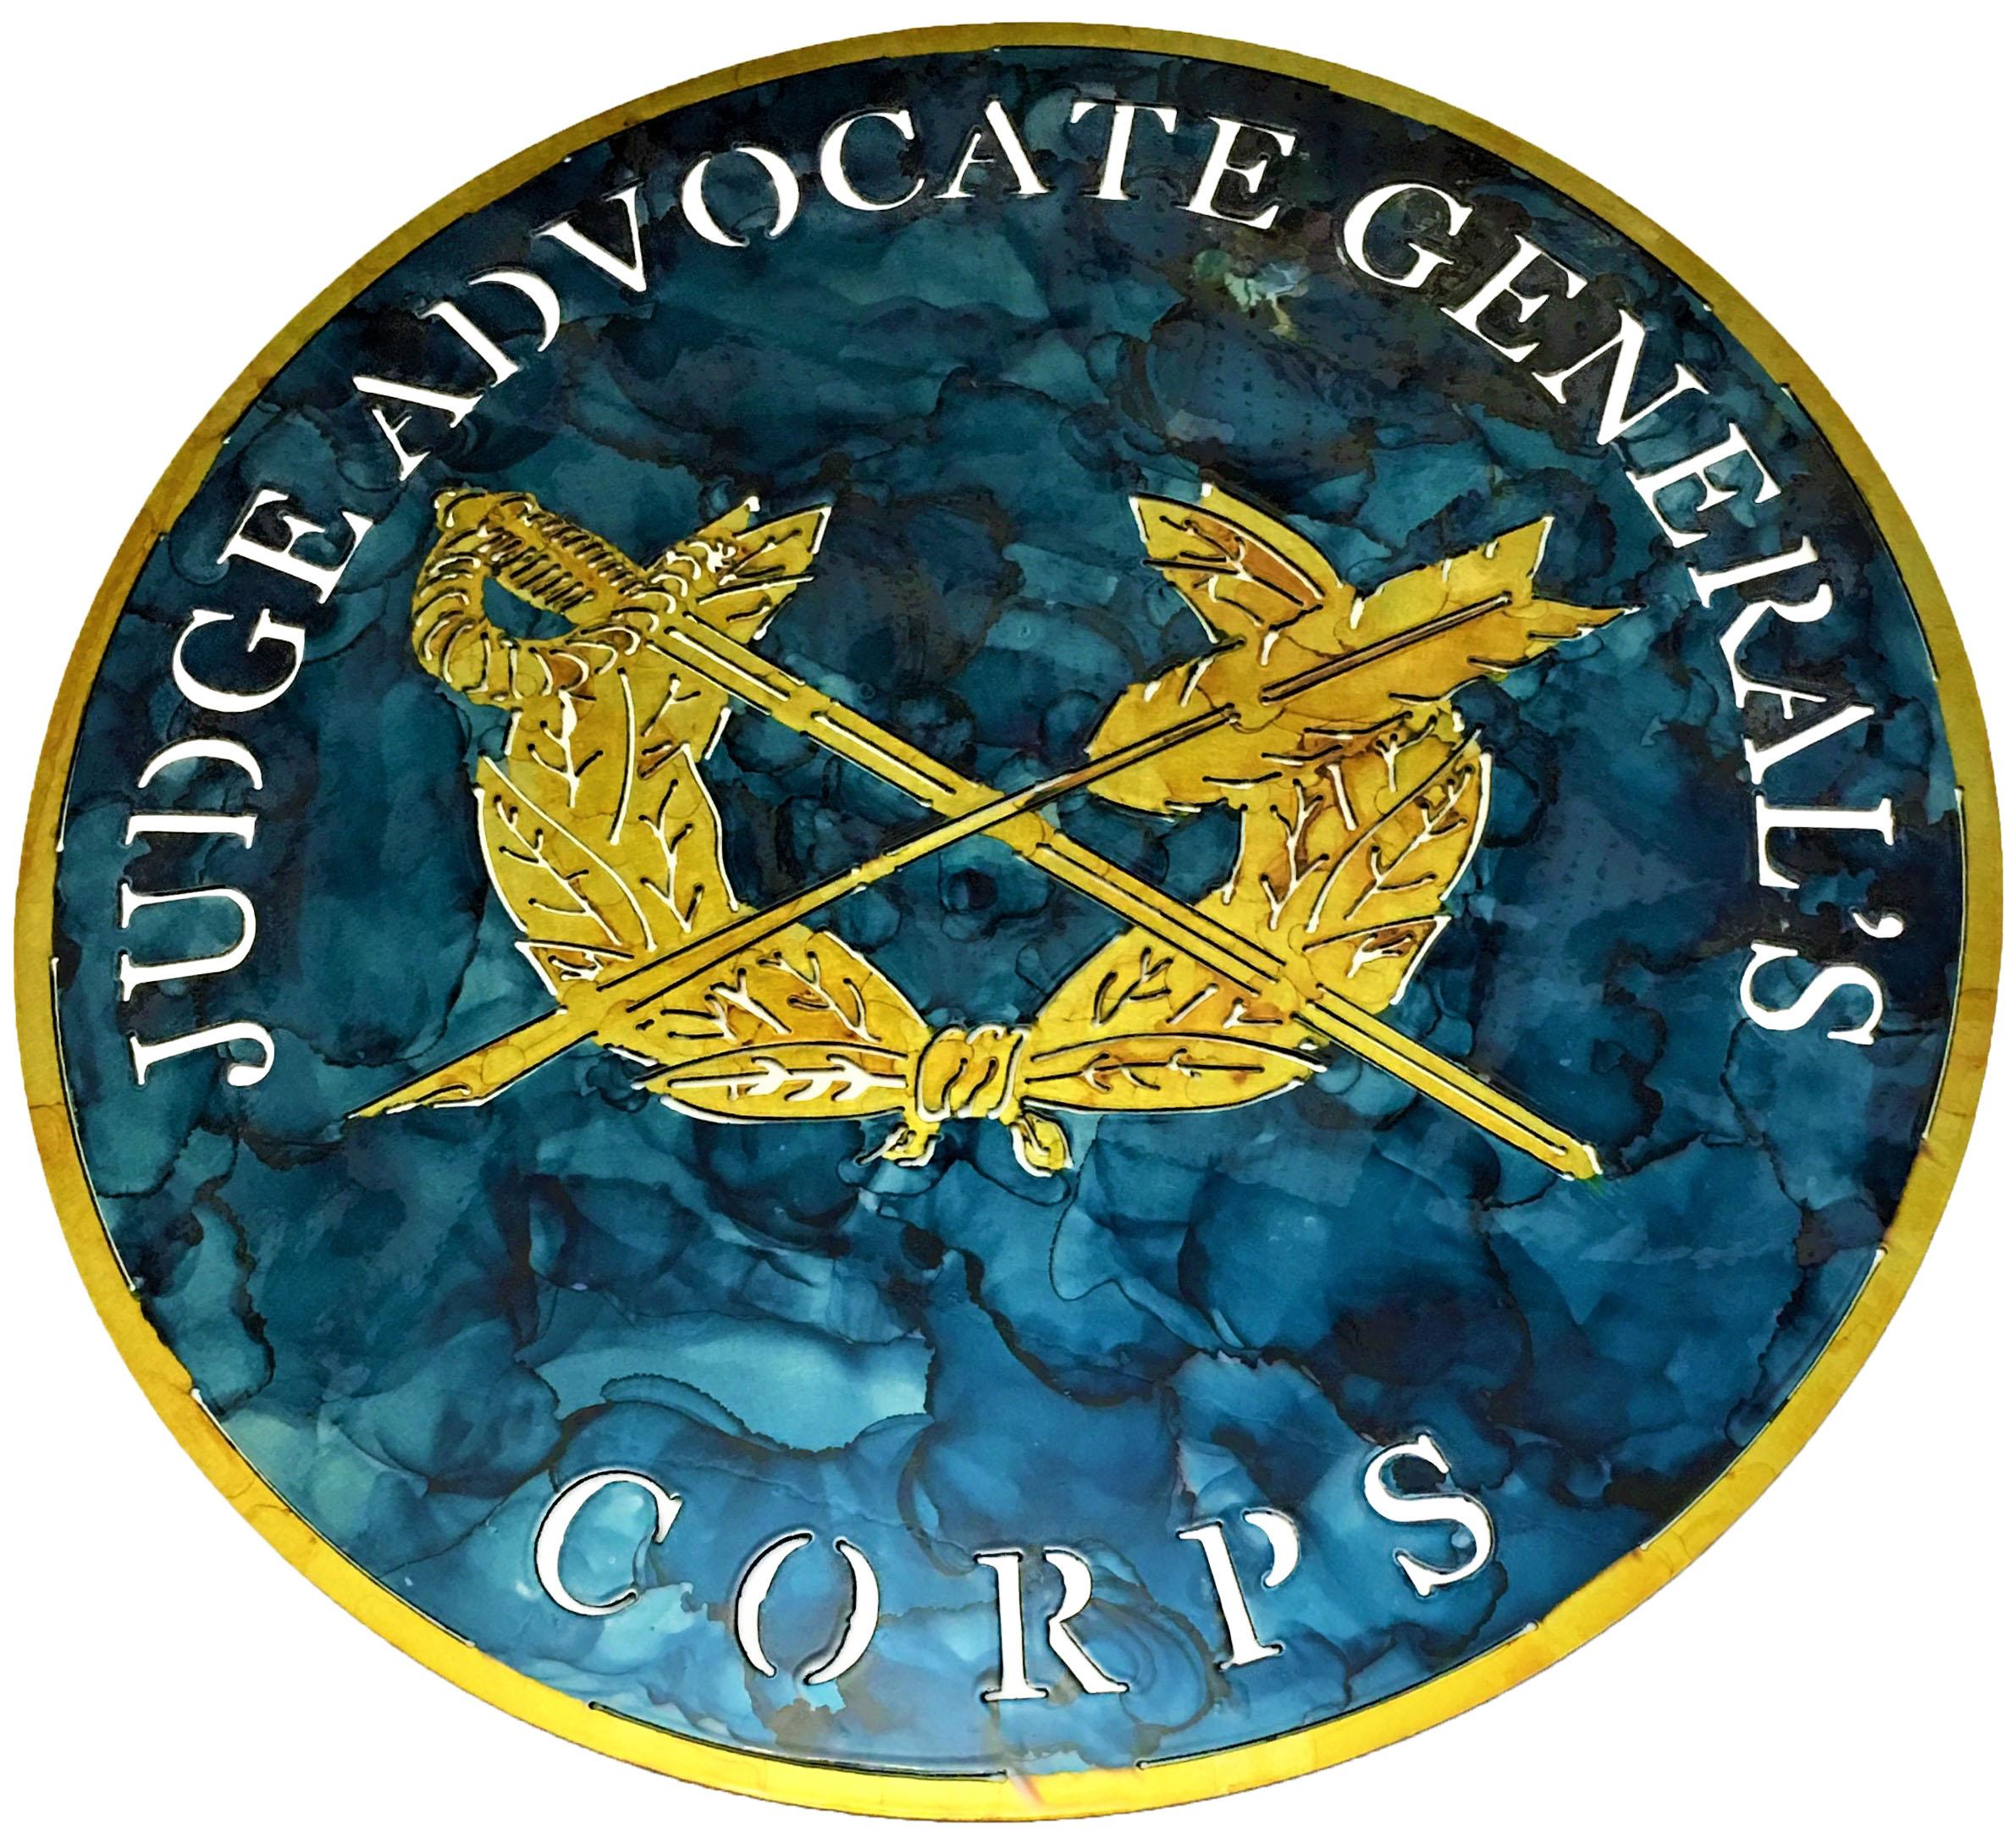 Judge Advocate General's Corp_MetalWork_